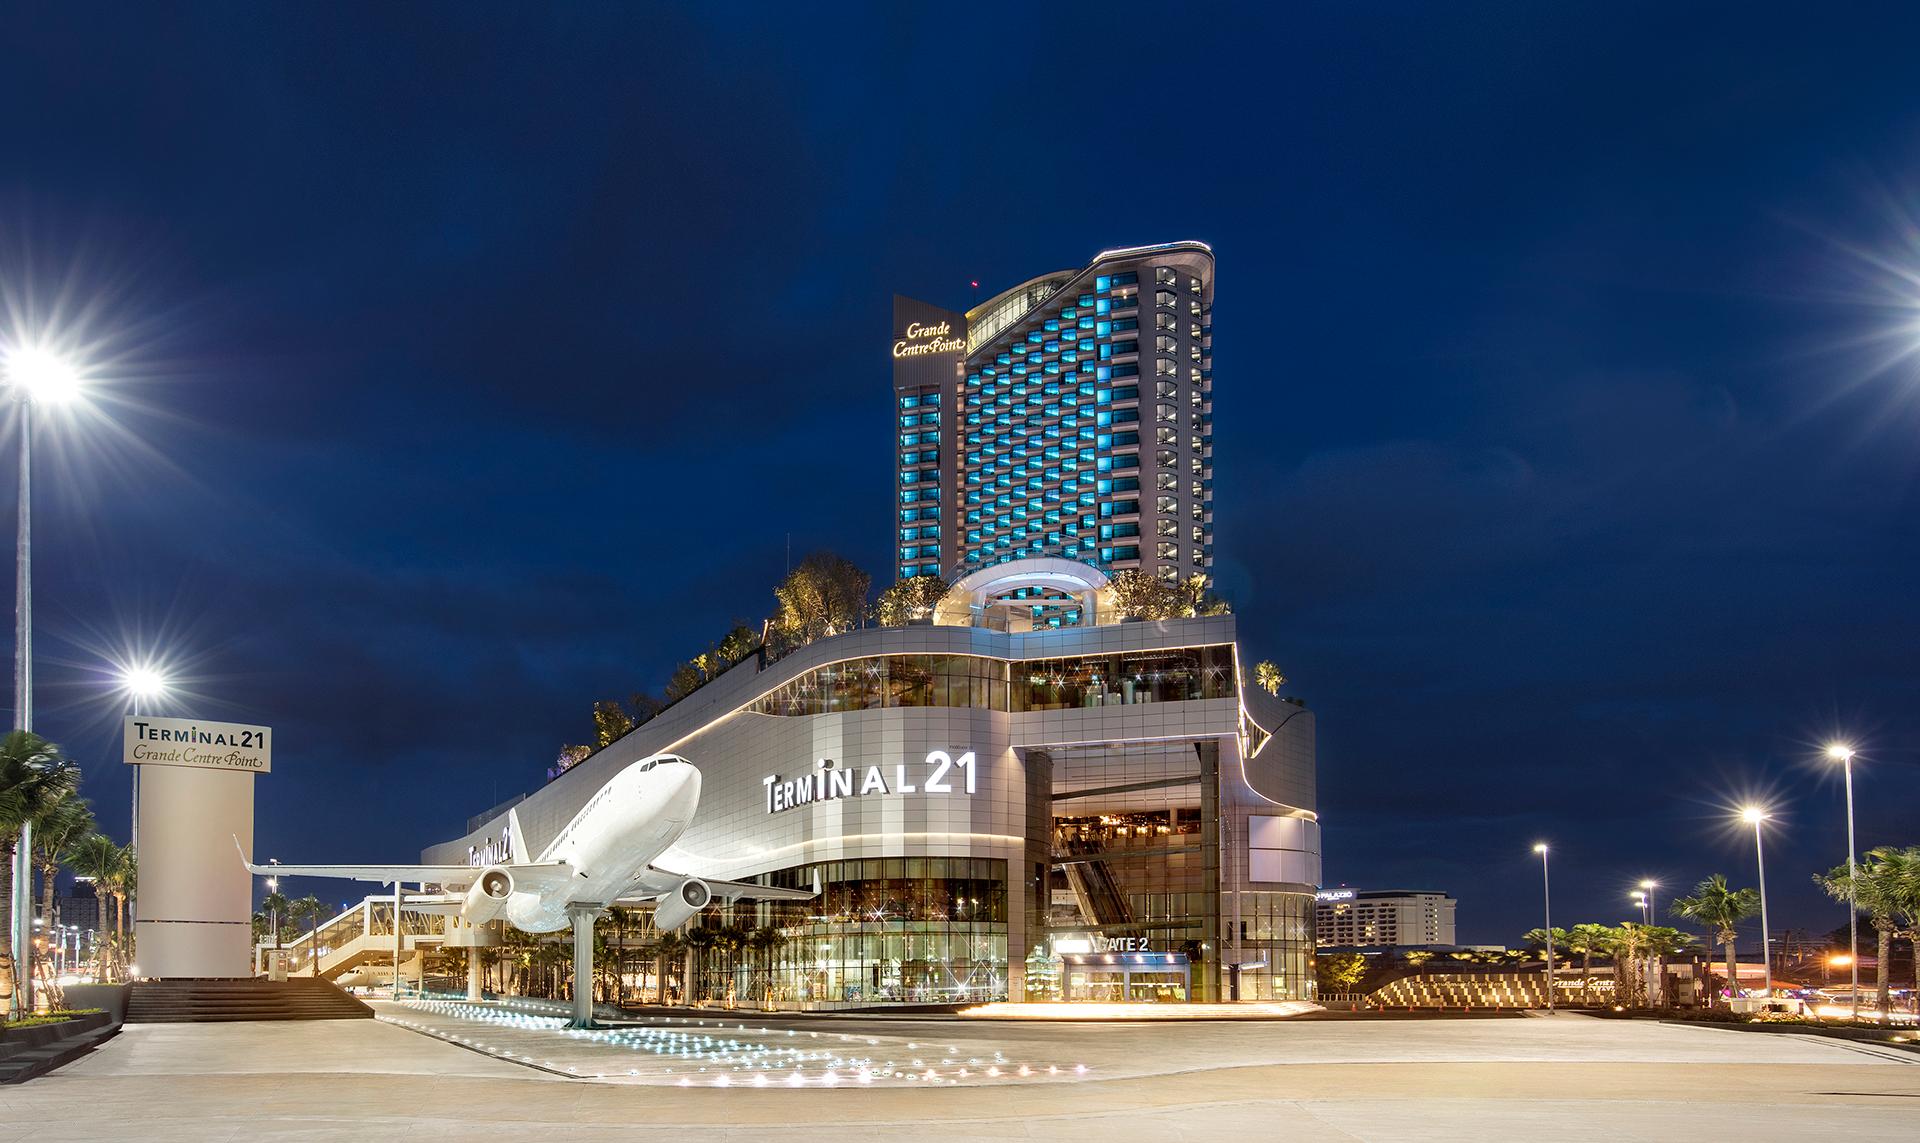 Terminal21 Pattaya Shopping Mall